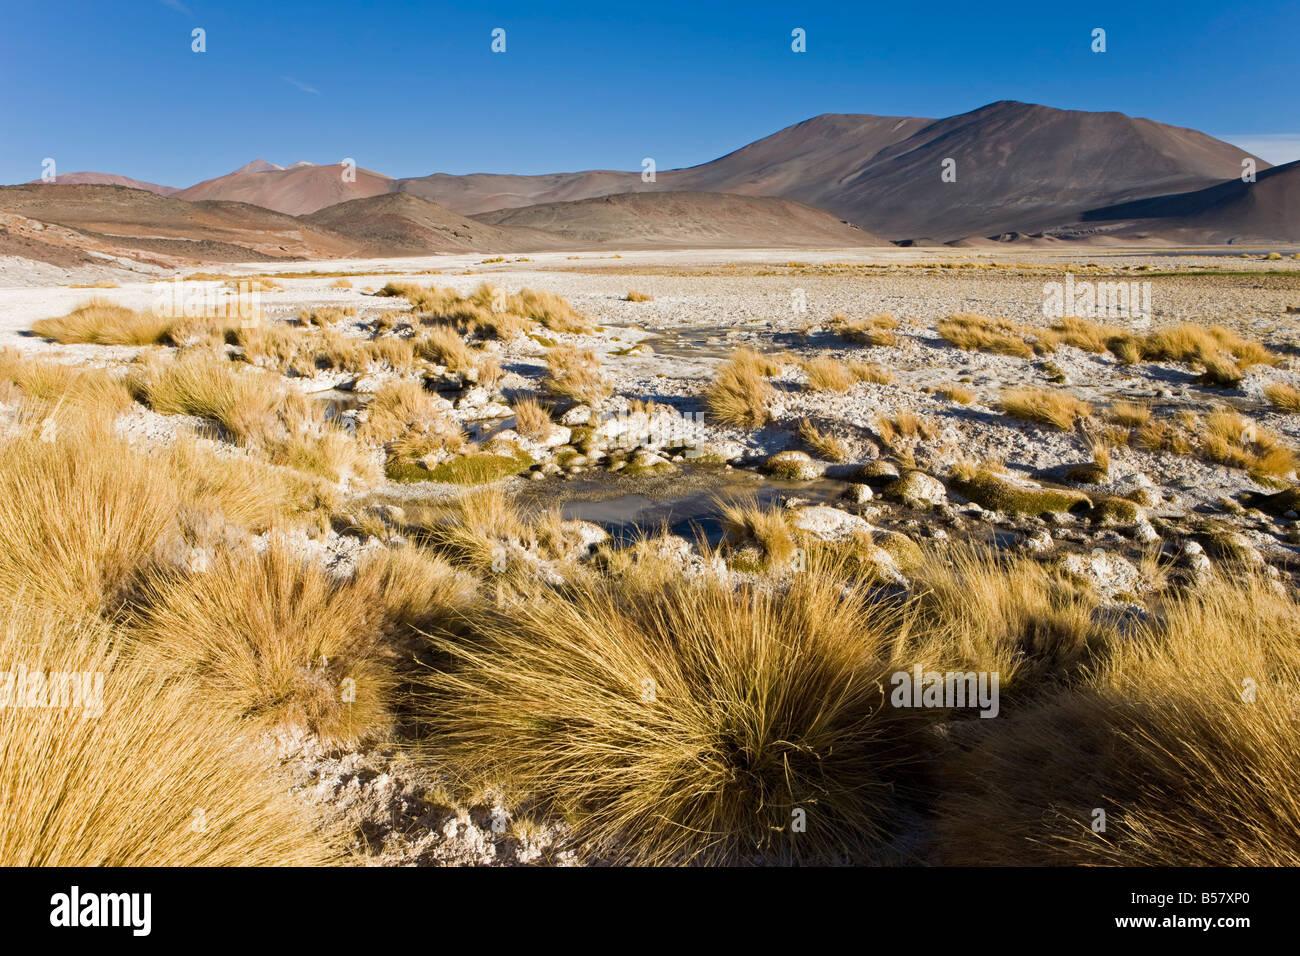 Altiplano, Los Flamencos National Reserve, Atacama Desert, Antofagasta Region, Chile - Stock Image